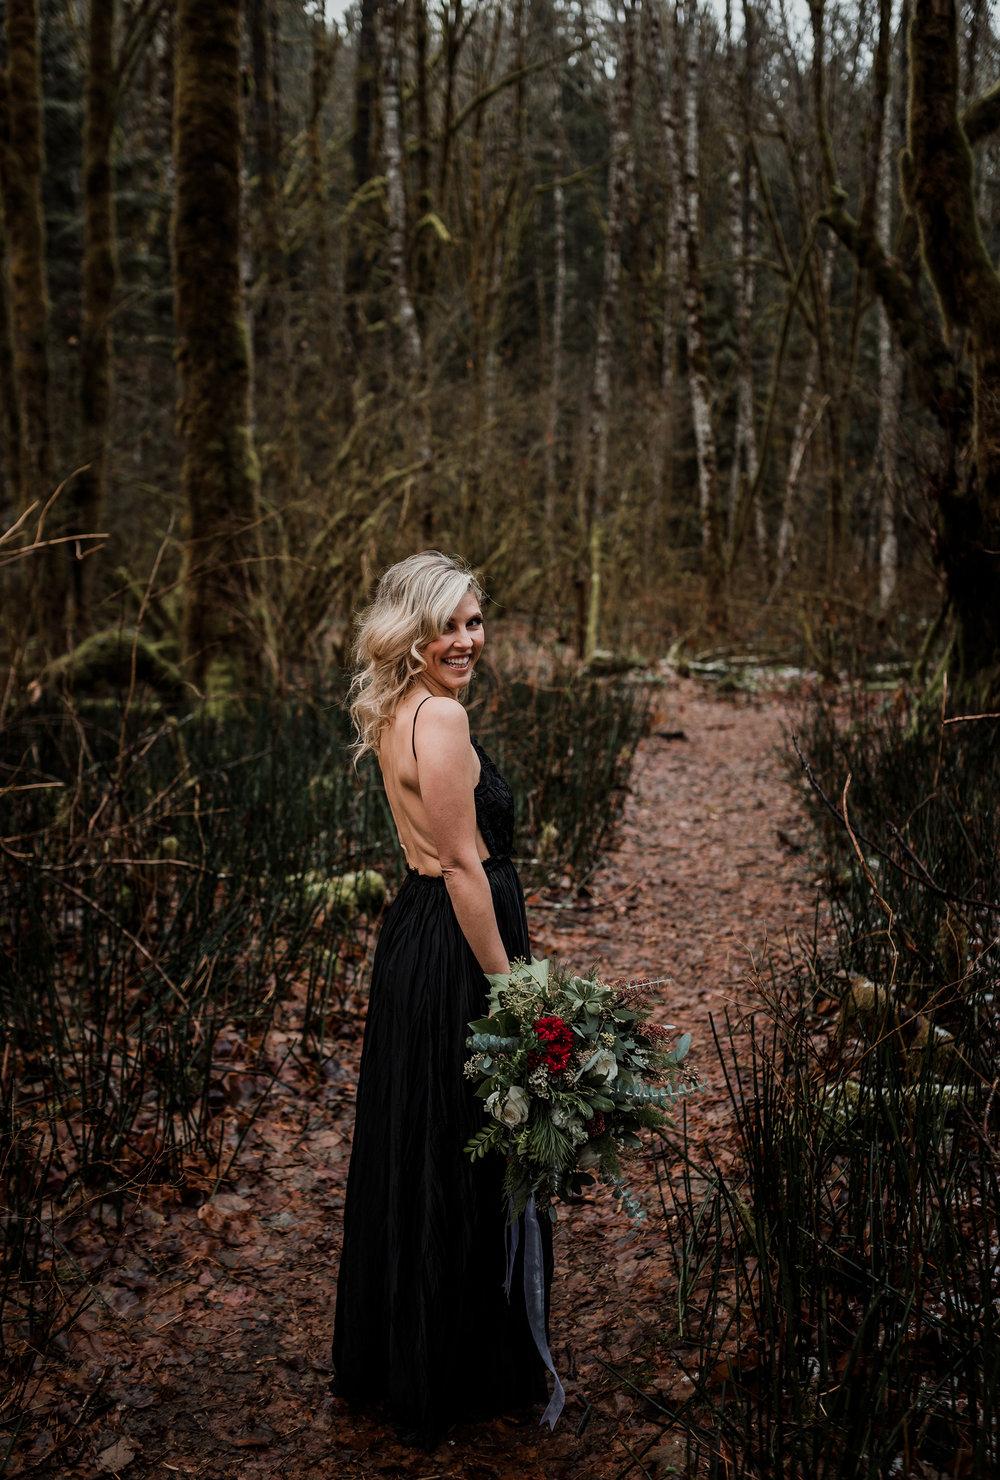 Squamish Wedding Photographer - Squamish Engagement Photos -  Vancouver Wedding Photographer & Videographer - Sunshine Coast Wedding Photos - Sunshine Coast Wedding Photographer - Jennifer Picard Photography - 1A5A2477.jpg